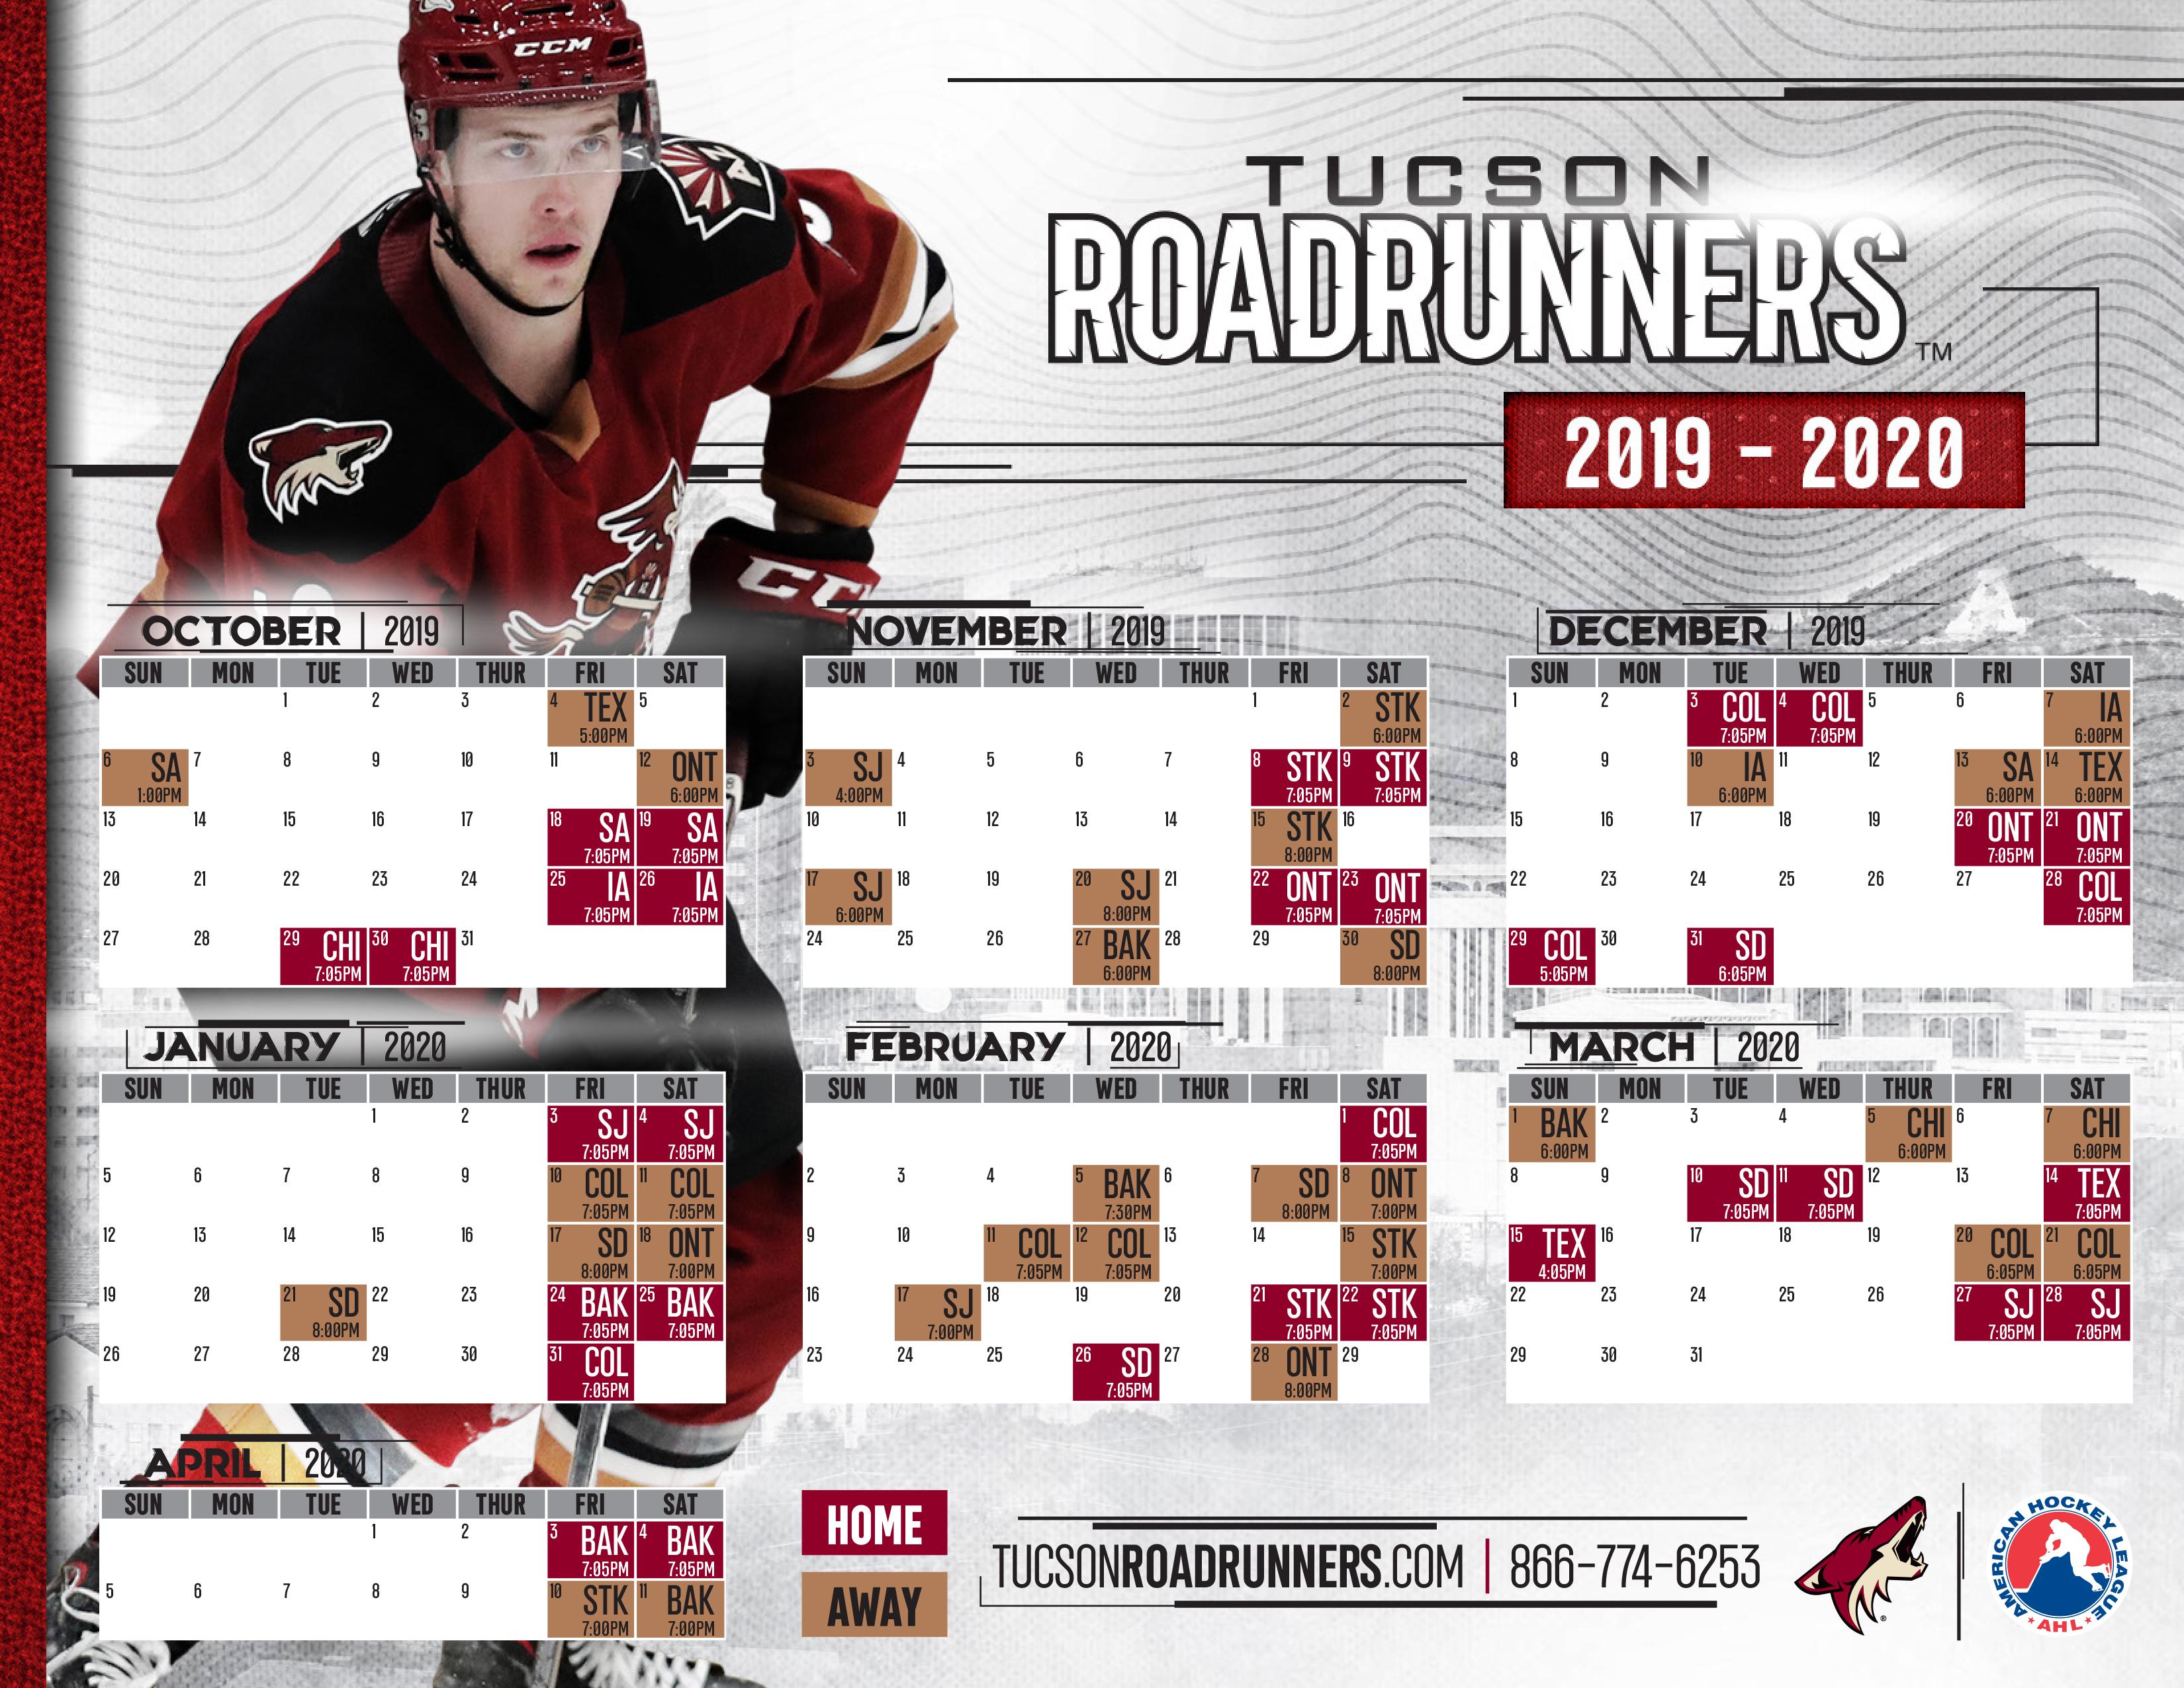 December 2020 Calendar For Tombstone, Az The Official Website of the Tucson Roadrunners: Hockey News